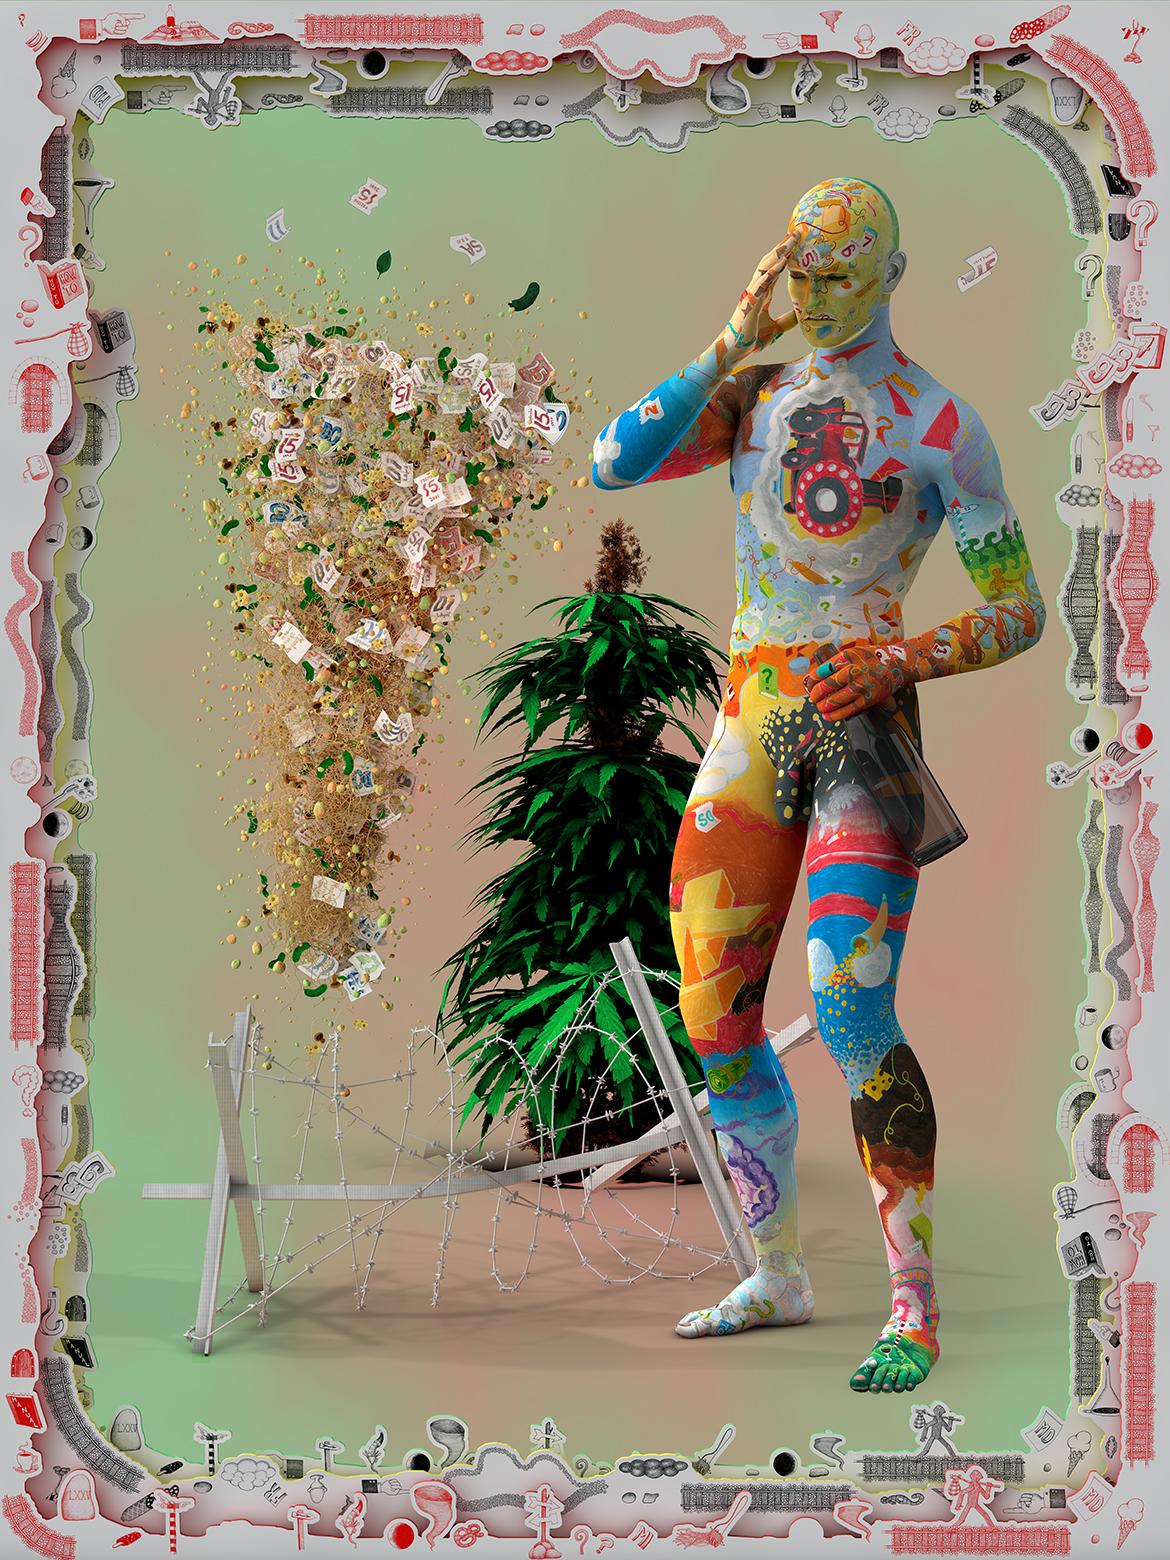 Aspettatori crapulent  2014, photography mounted on dibond (framed), 240 cm x 180 cm